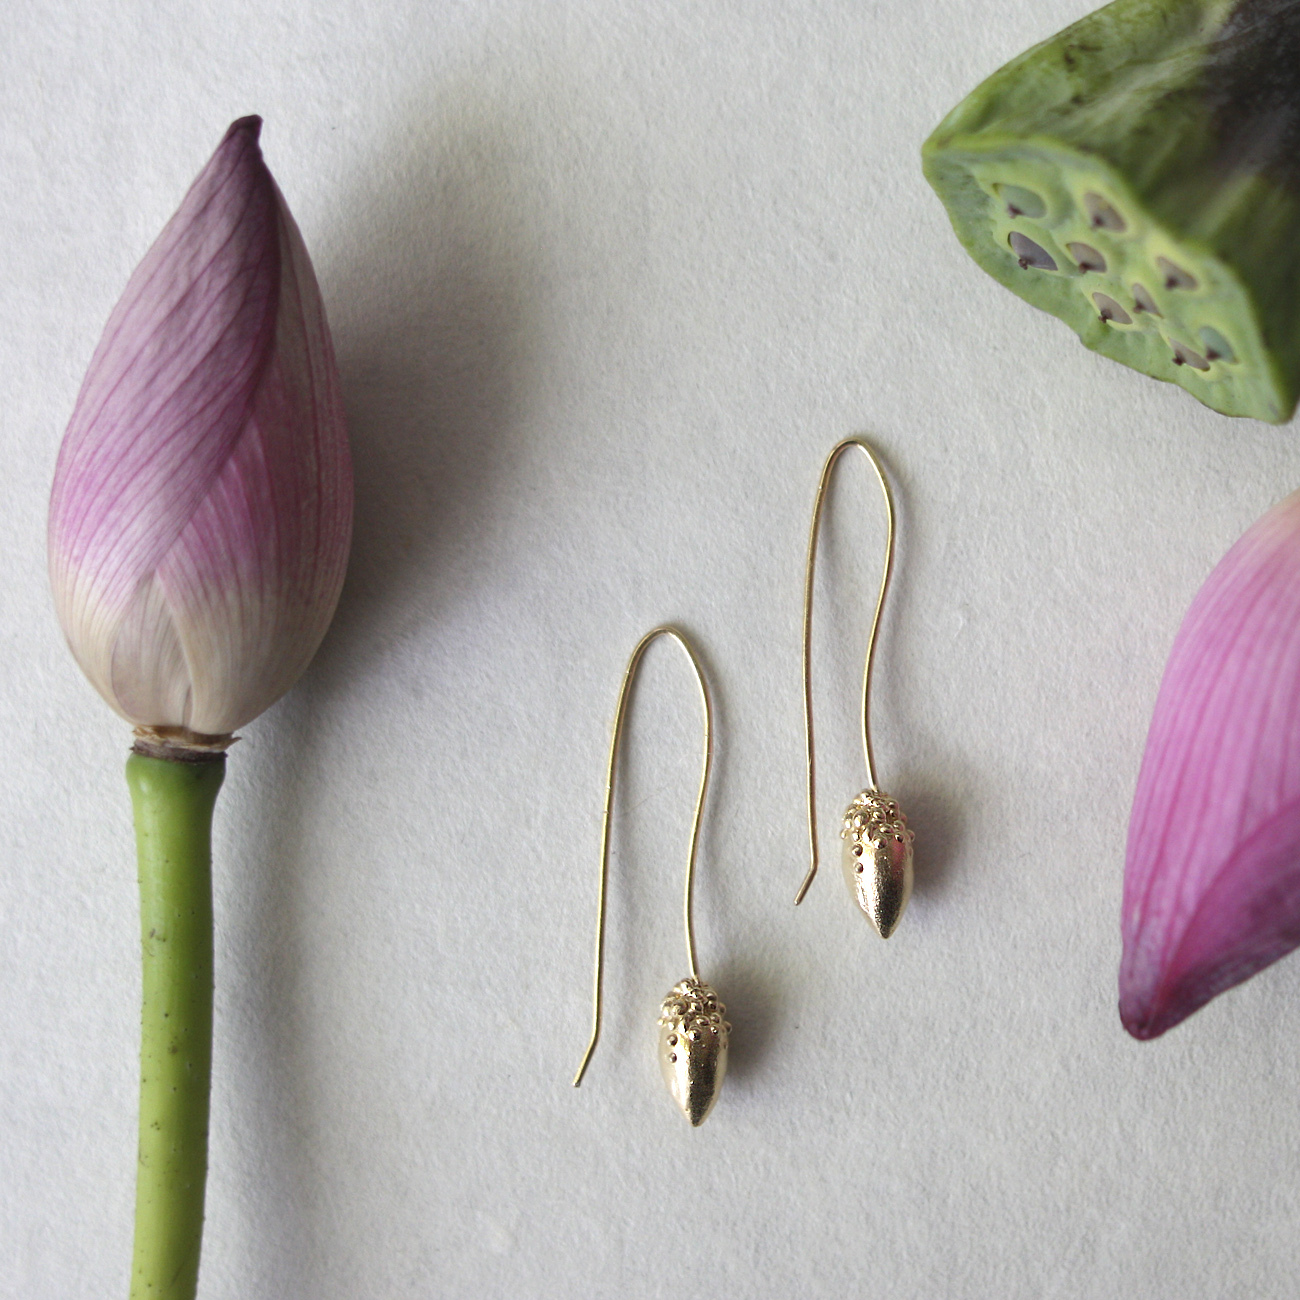 lotus bud ピアス -gold-